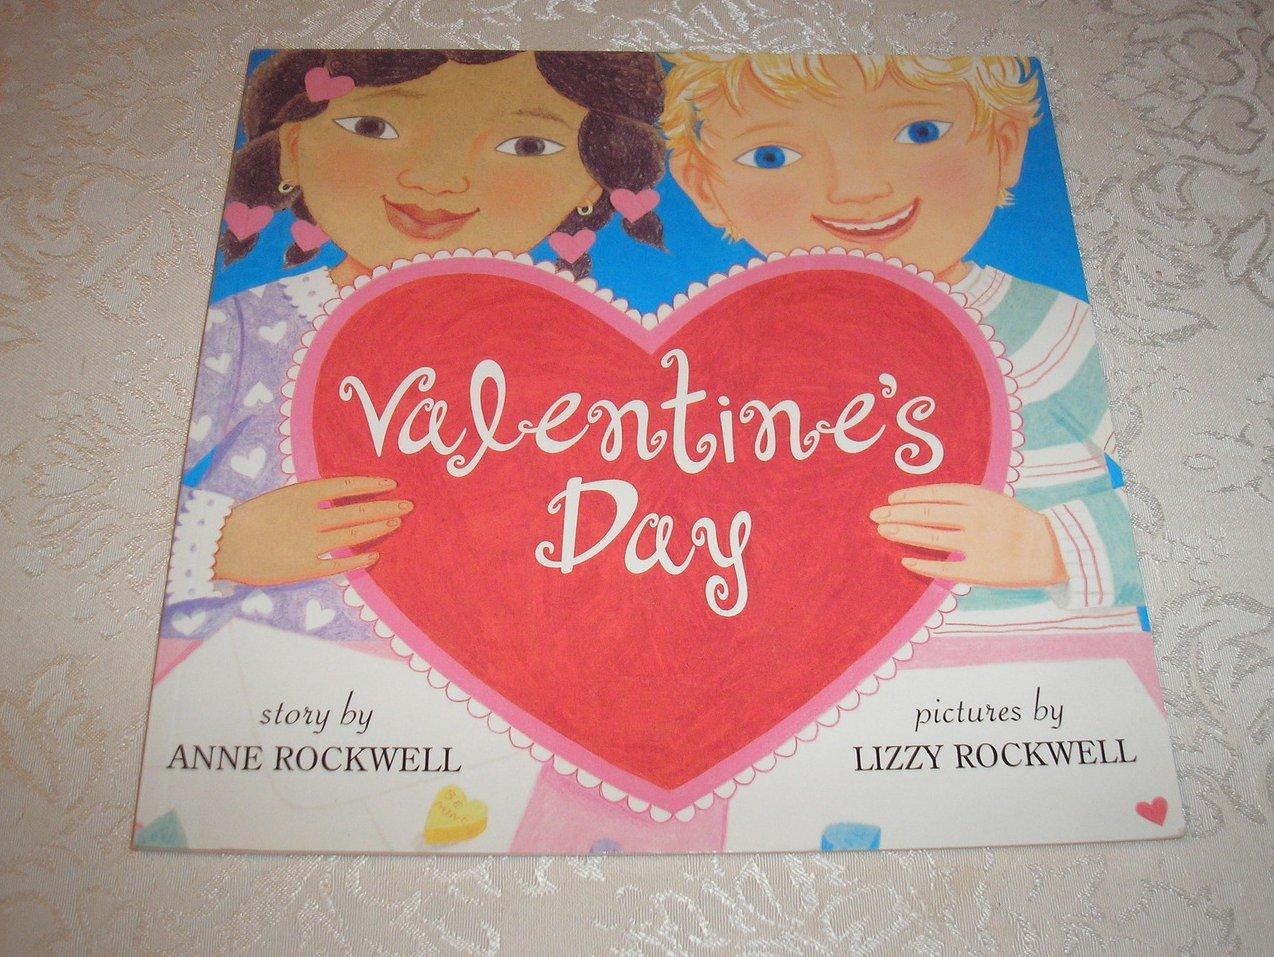 Valentine's Day Anne Rockwell very good sc